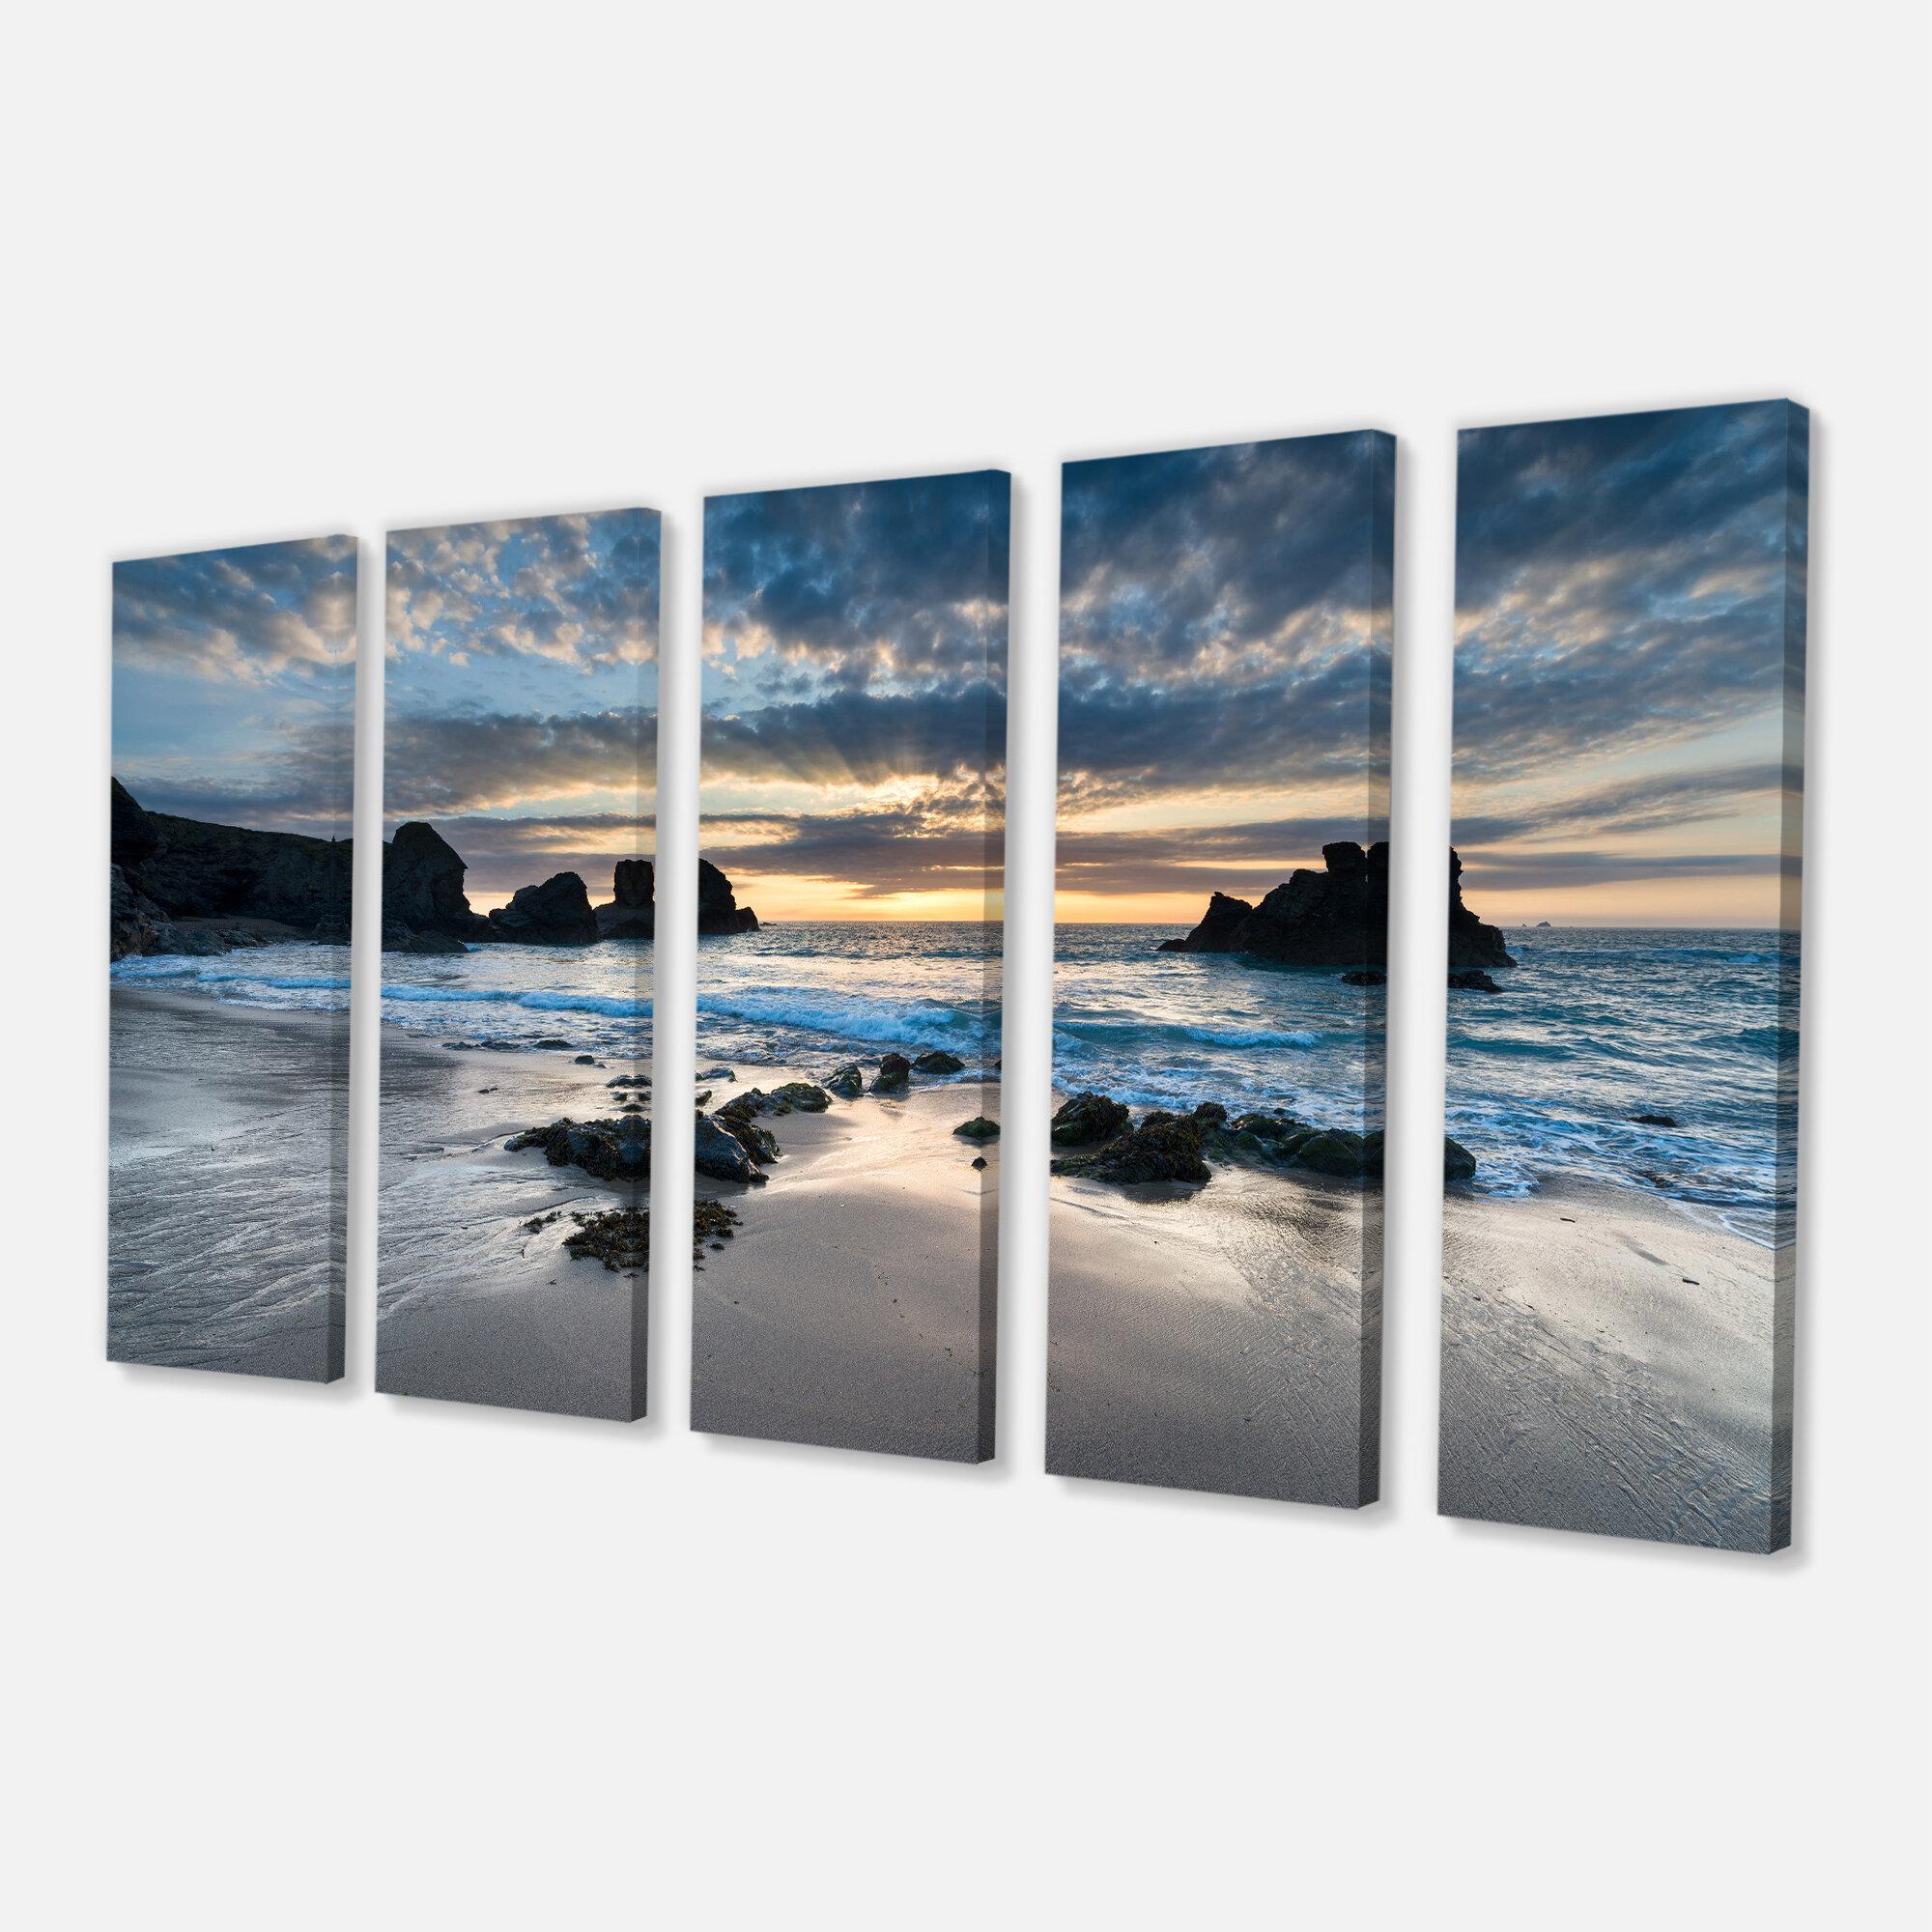 Designart Beautiful Porthcothan Bay 5 Piece Photographic Print On Wrapped Canvas Set Reviews Wayfair